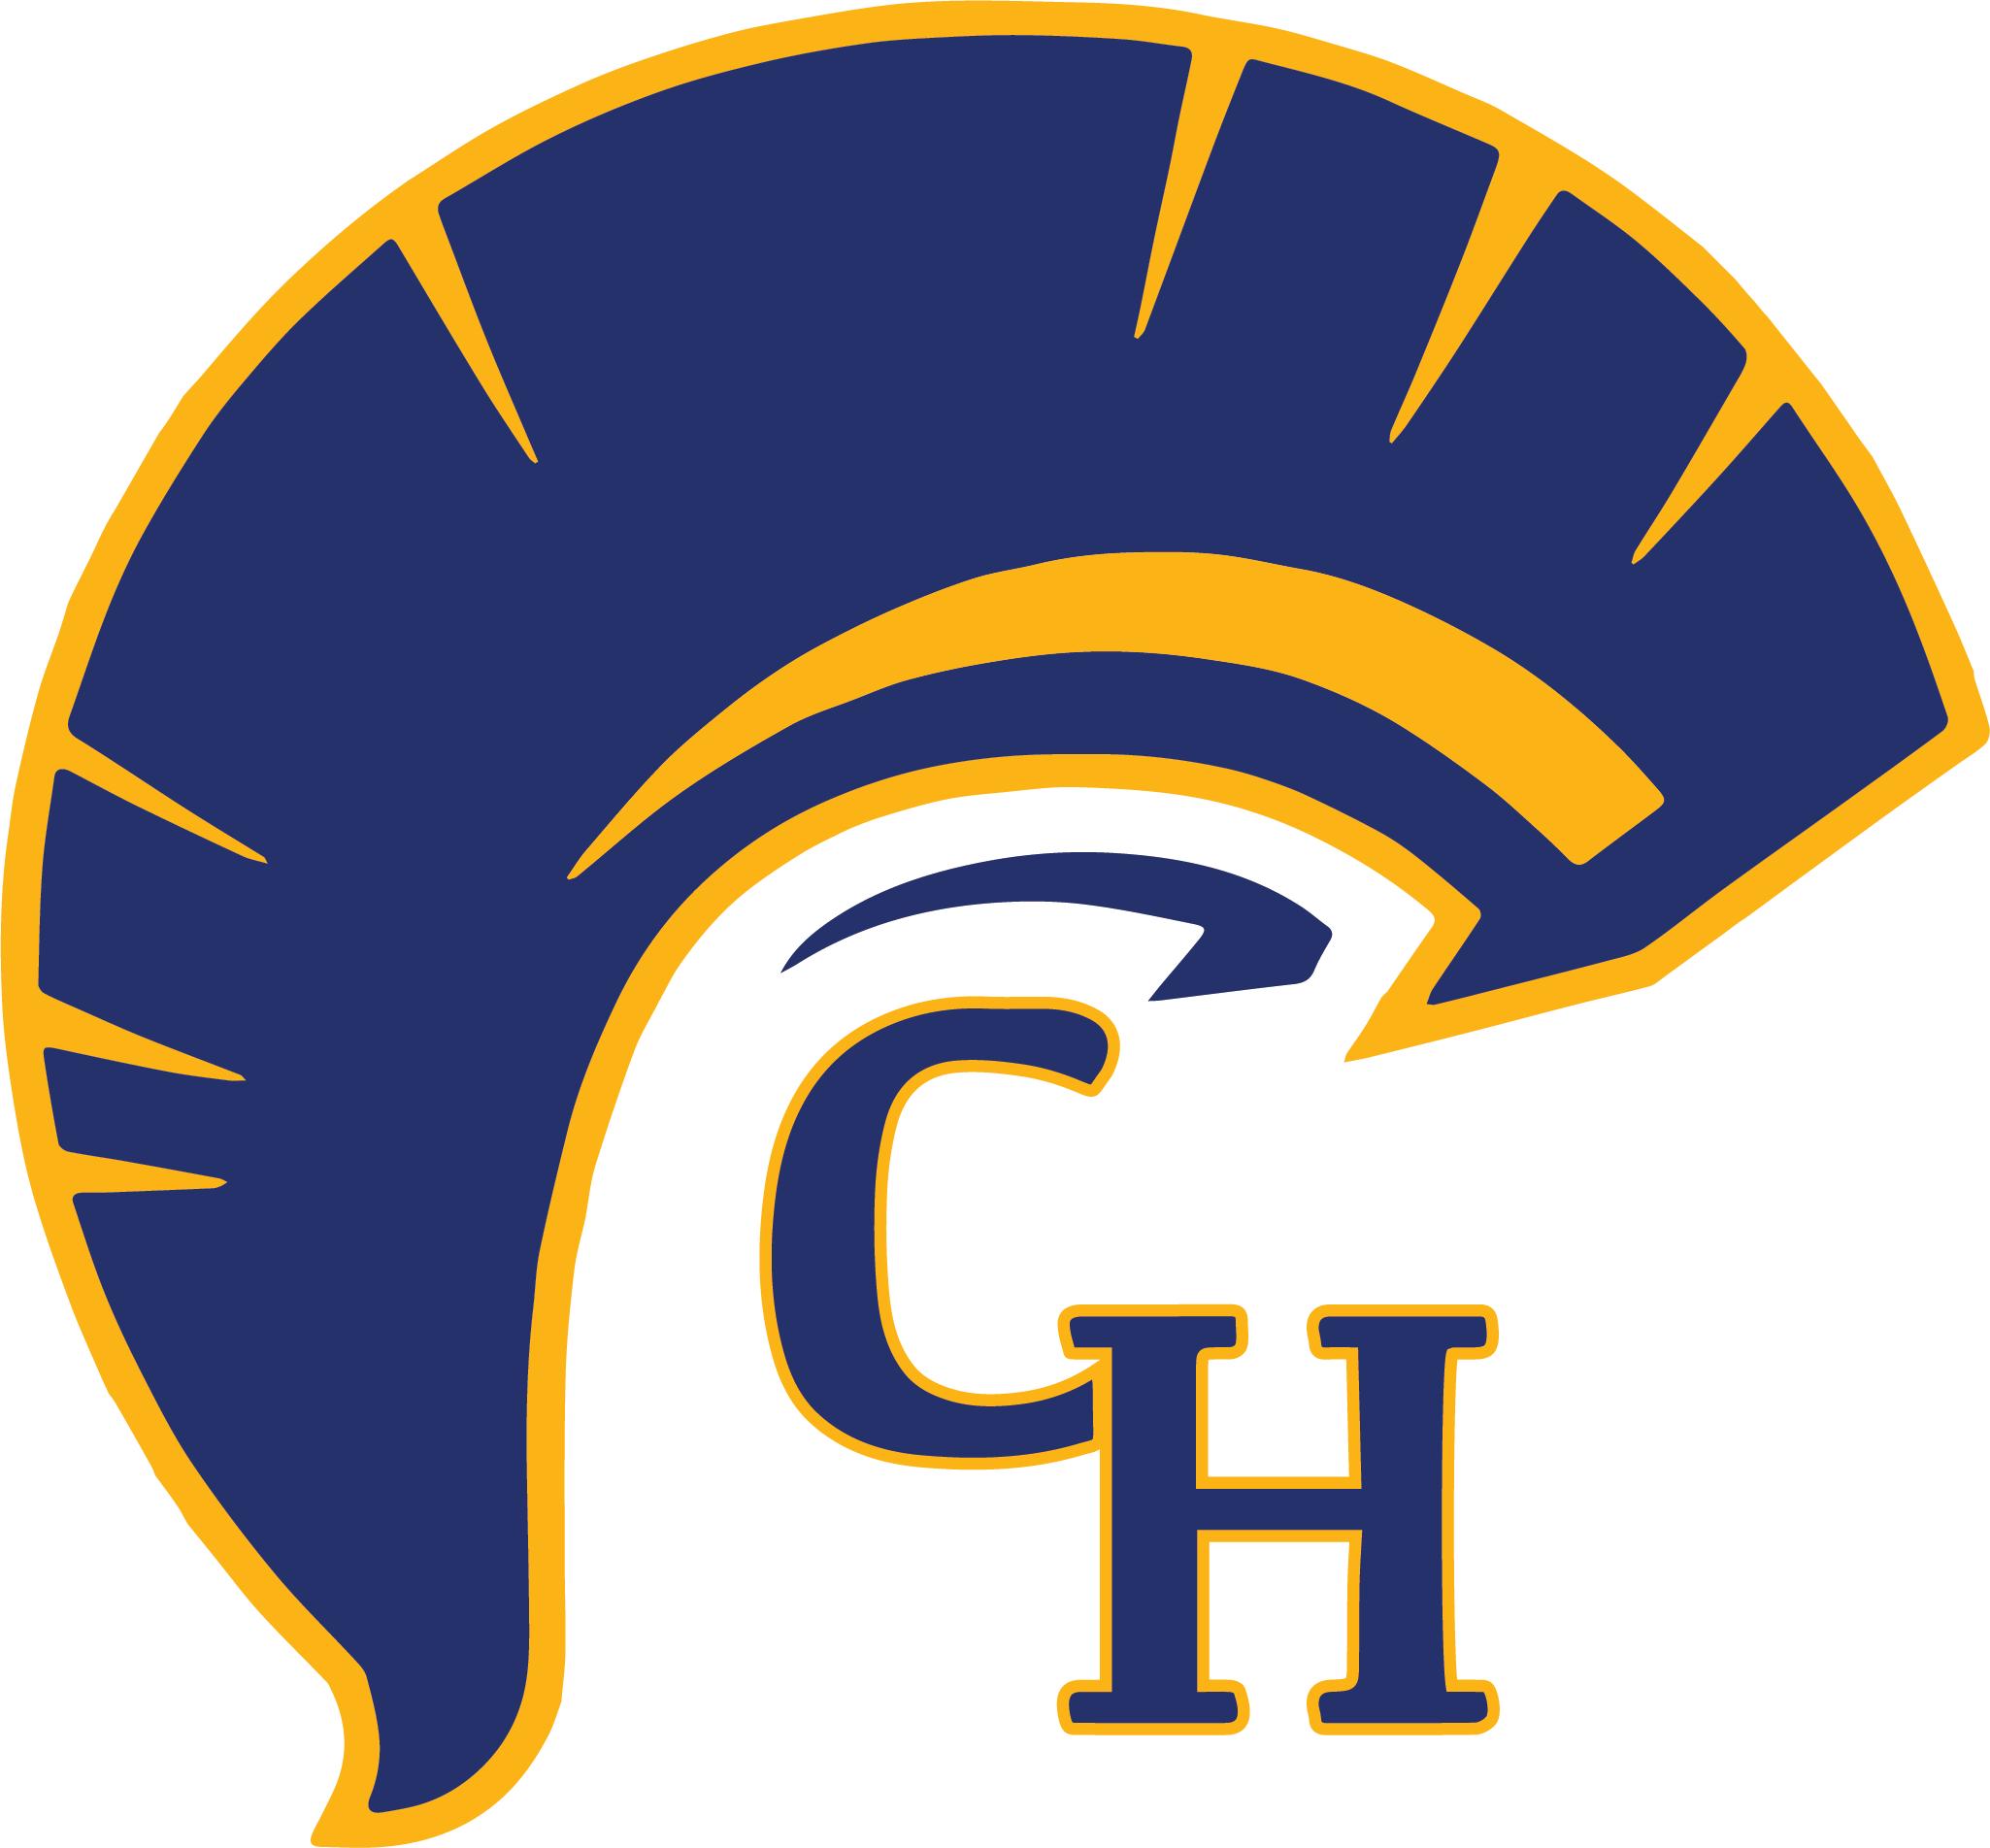 Cottage Hill Football Logo